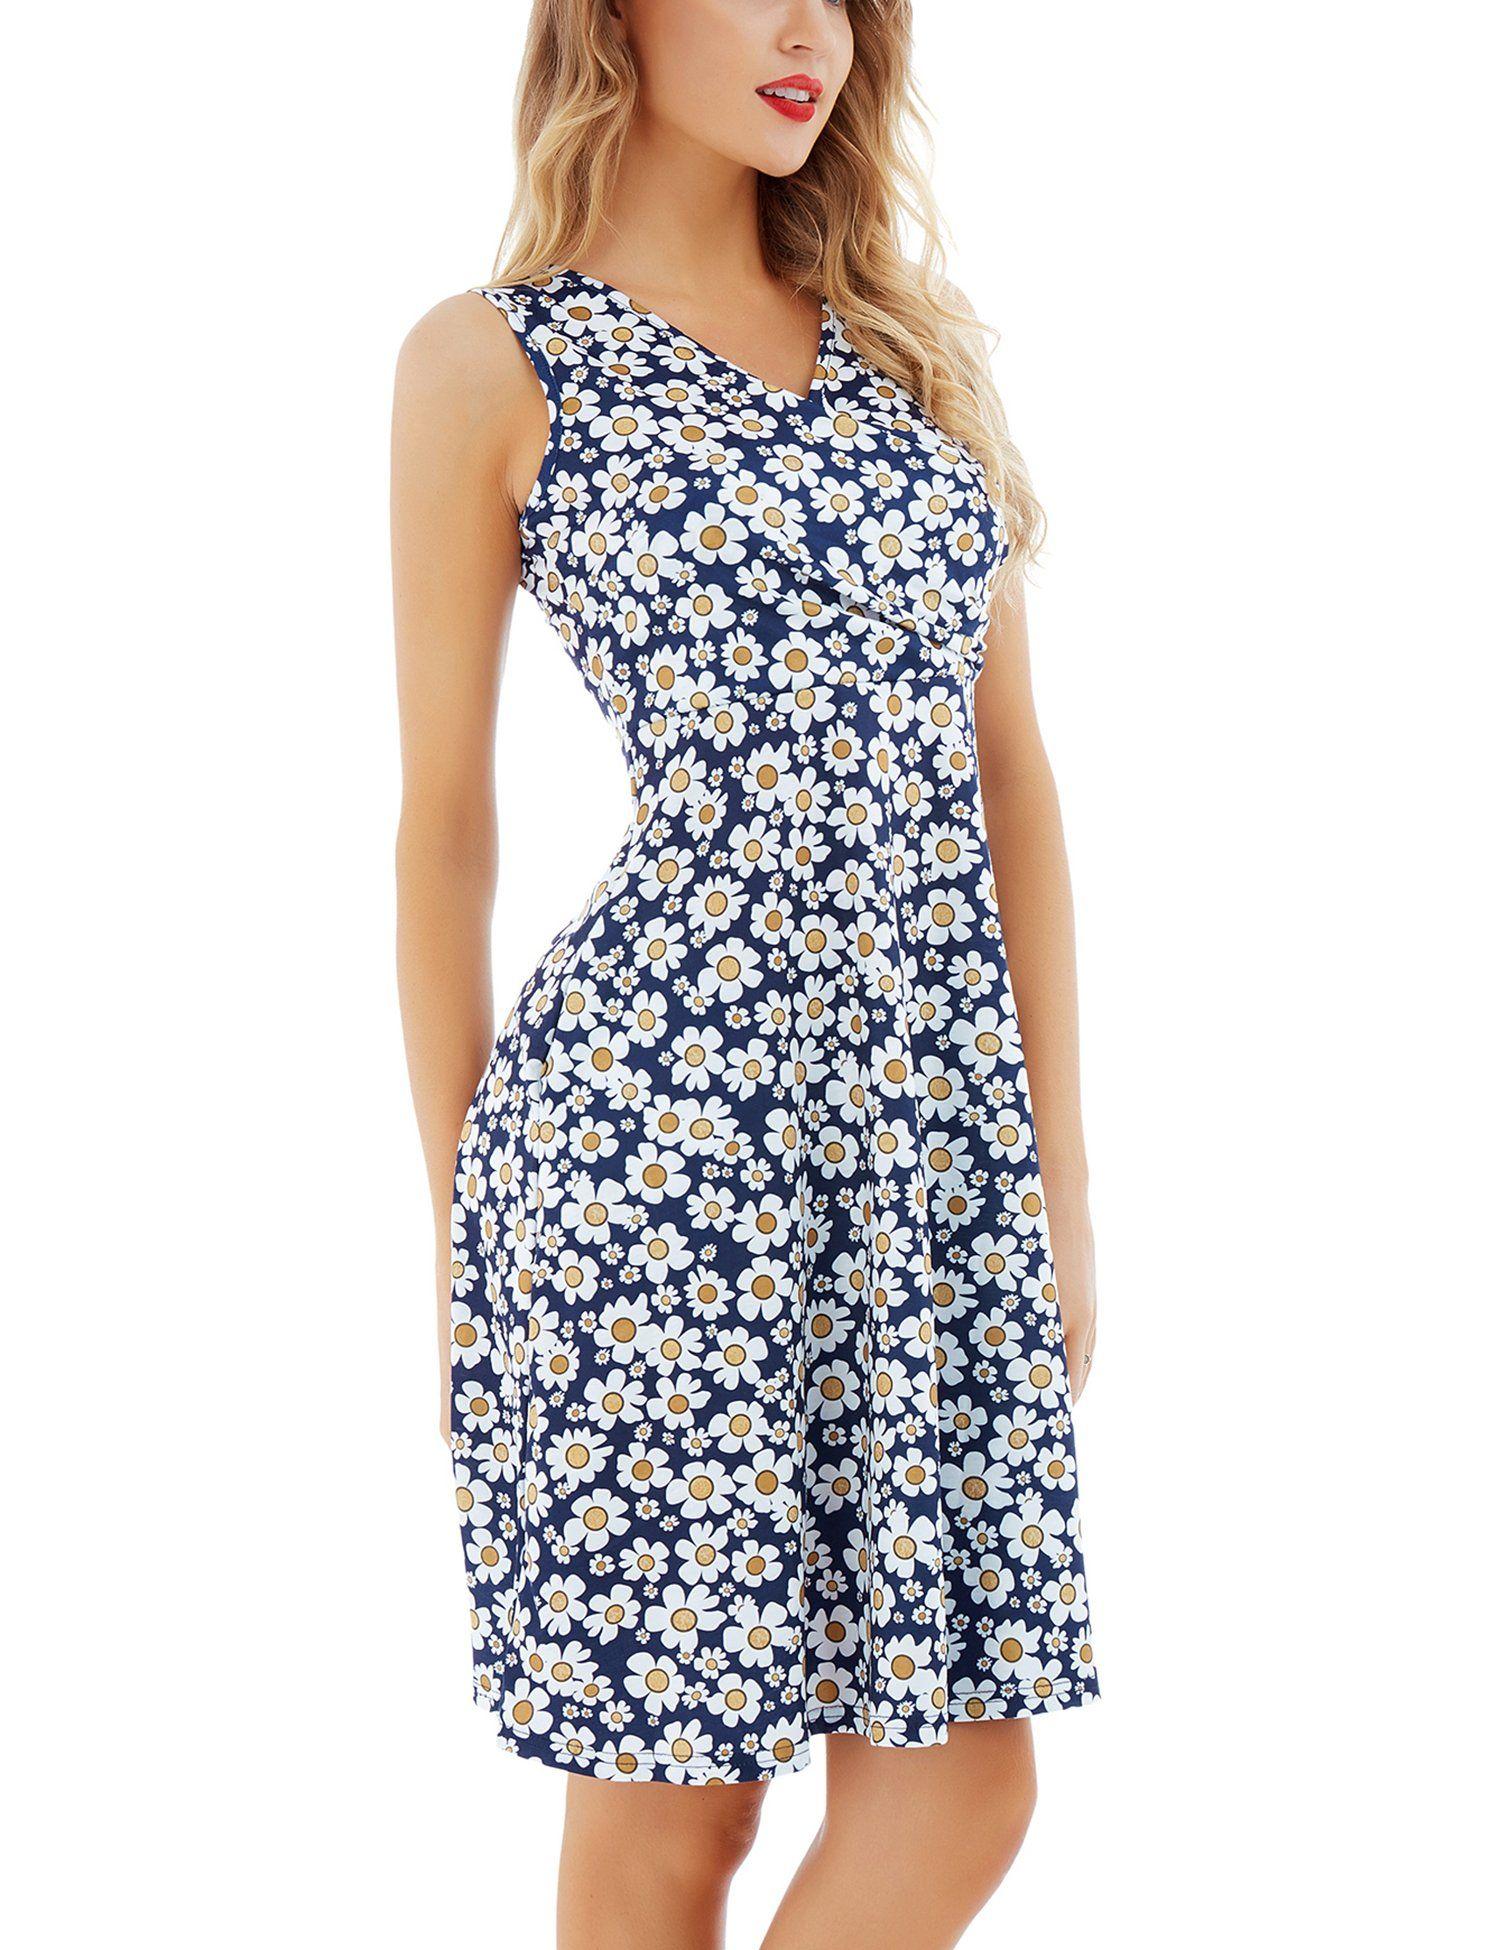 Maternity Dresses Uniboutique Womens Elegant Ladies Floral Print Faux Wrap V Neck Sleeveless Summer Swing Dresses Swing Dress With Pockets Swing Tshirt Dress [ 1950 x 1500 Pixel ]